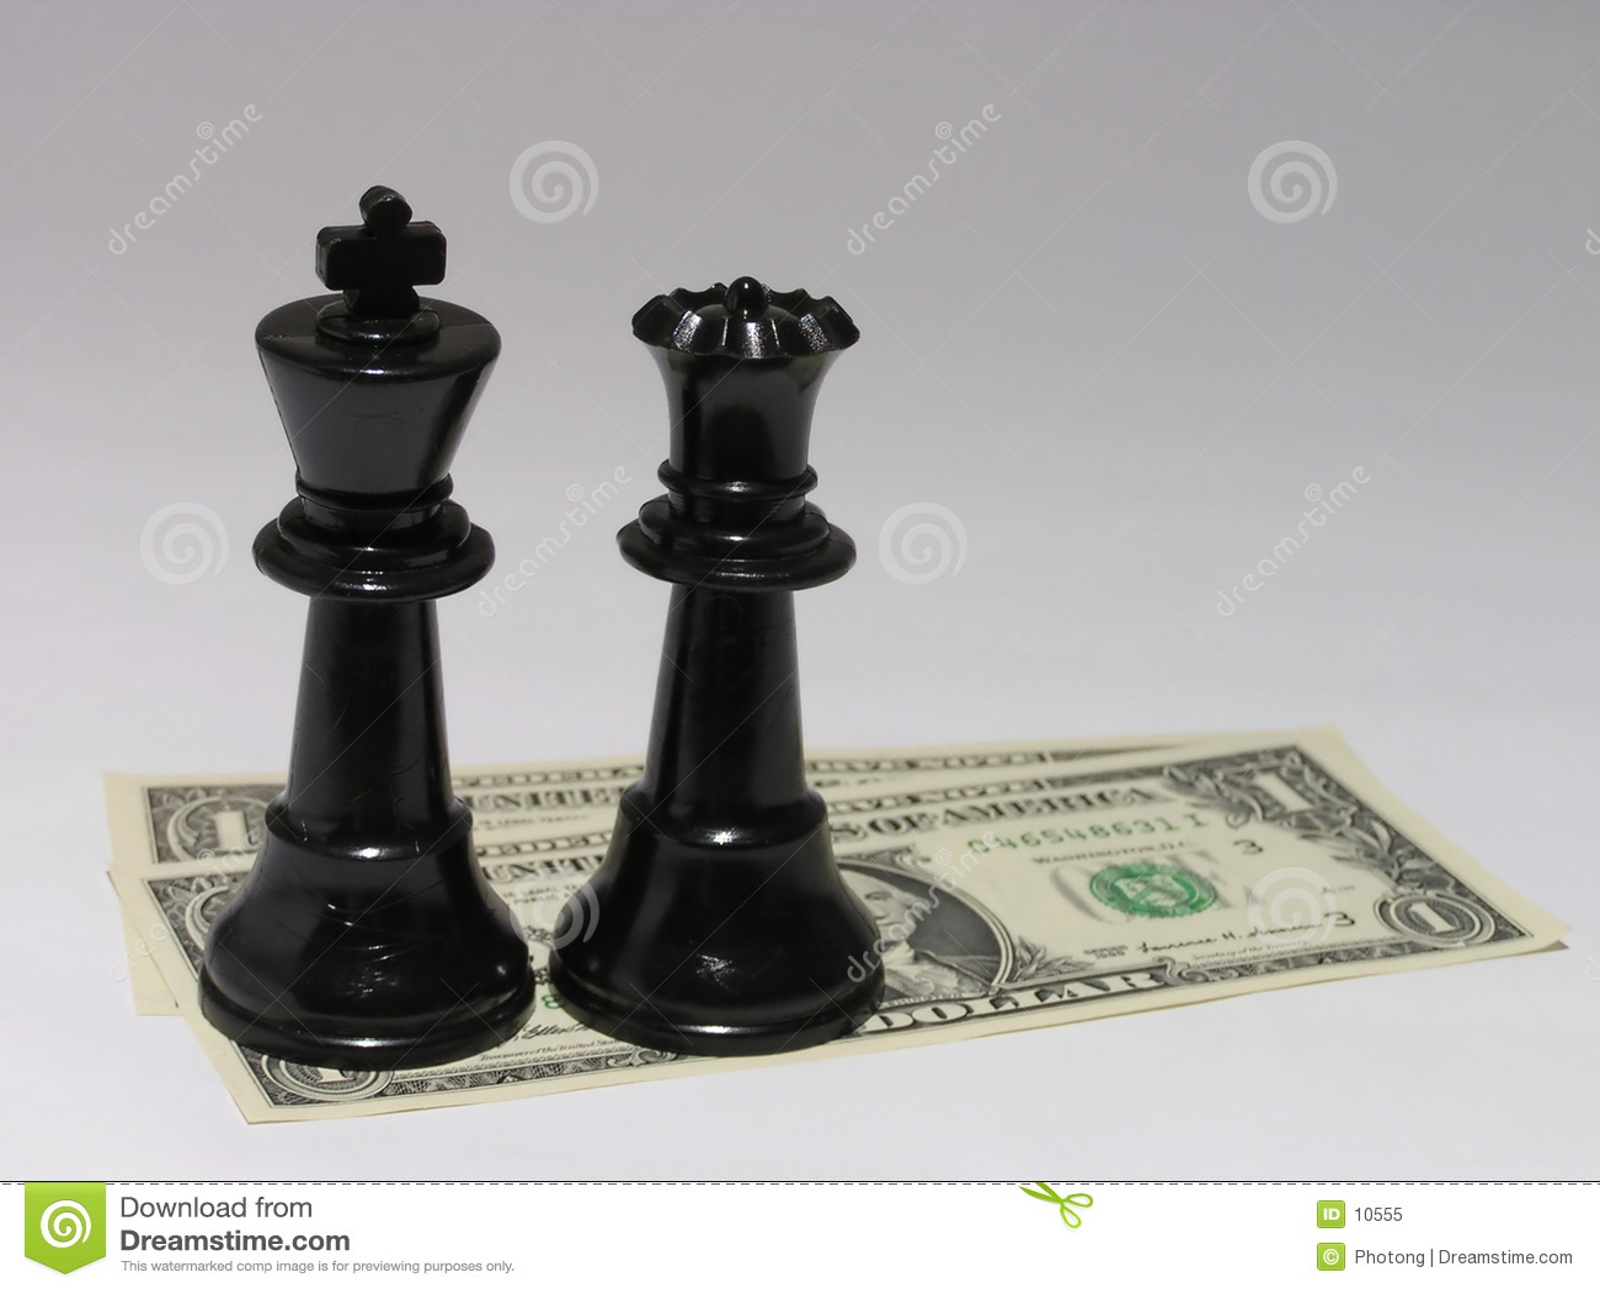 Cash is king #2